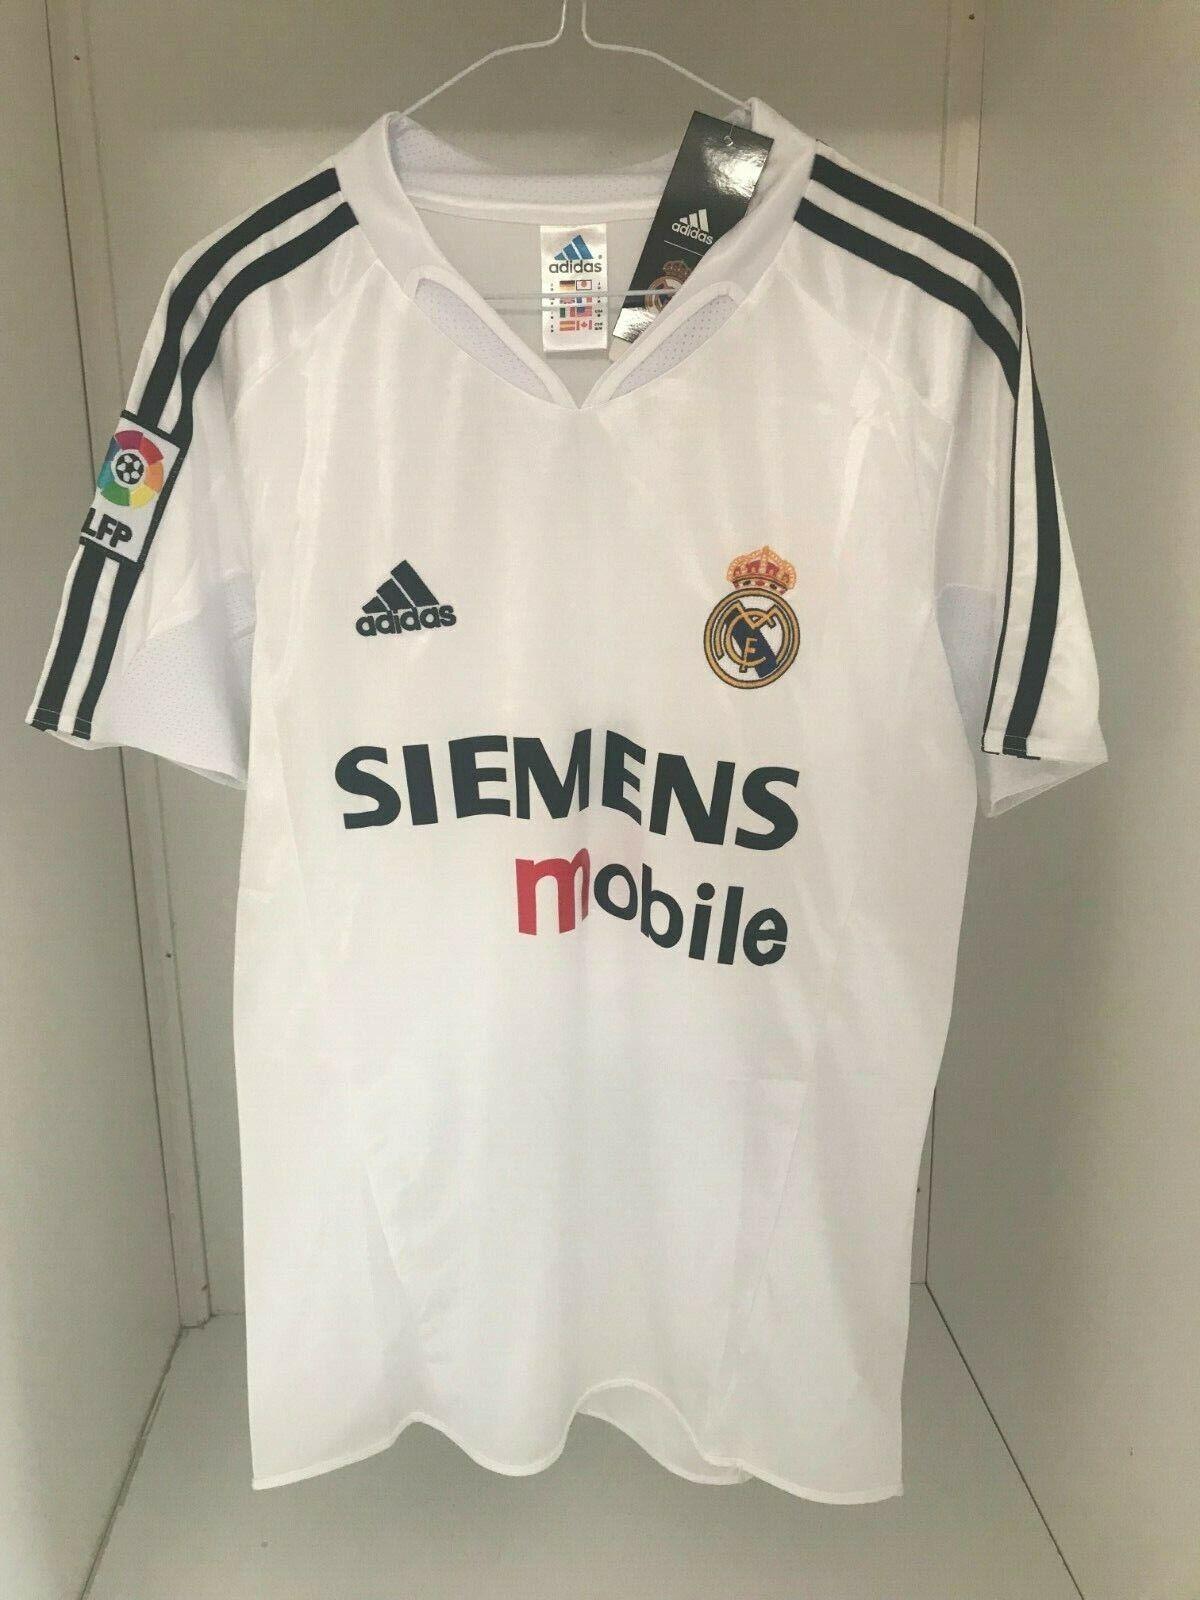 ADIDAS camiseta vintage-retro Real Madrid 2004-2005 ZIDANE NUEVA